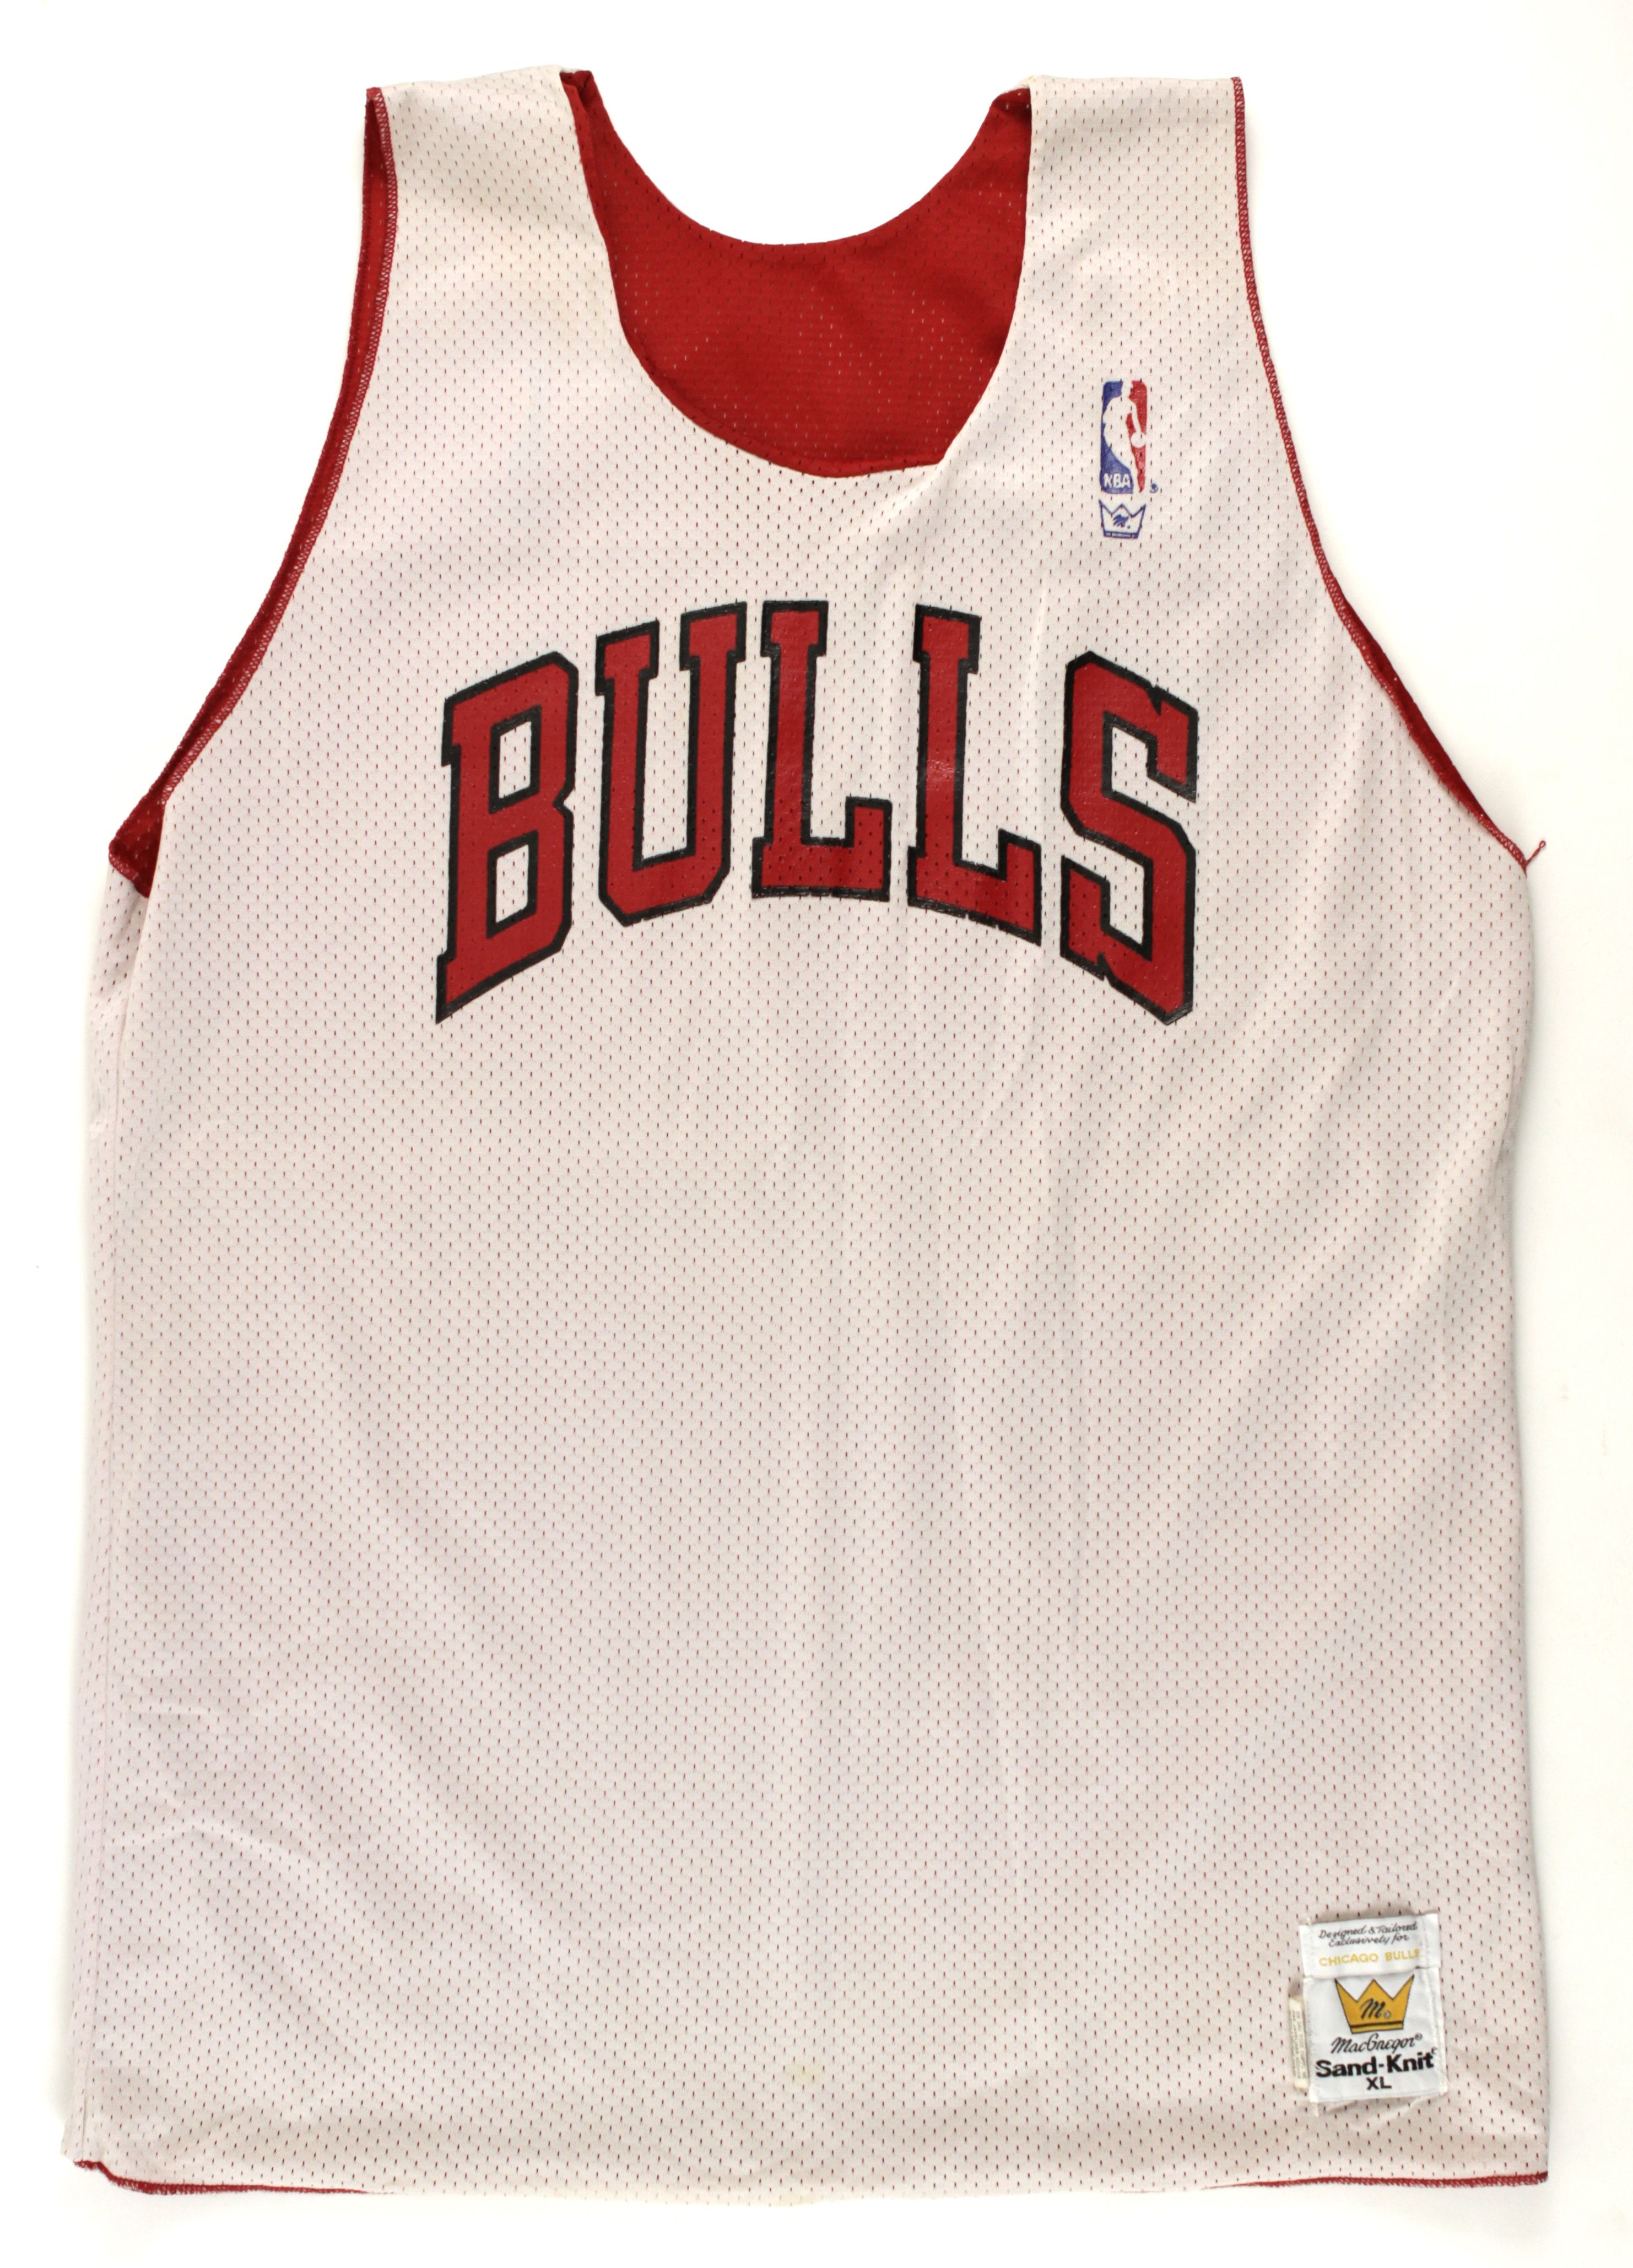 brand new 5fdd7 52f6c Lot Detail - 1987-88 Michael Jordan Chicago Bulls Game Worn ...